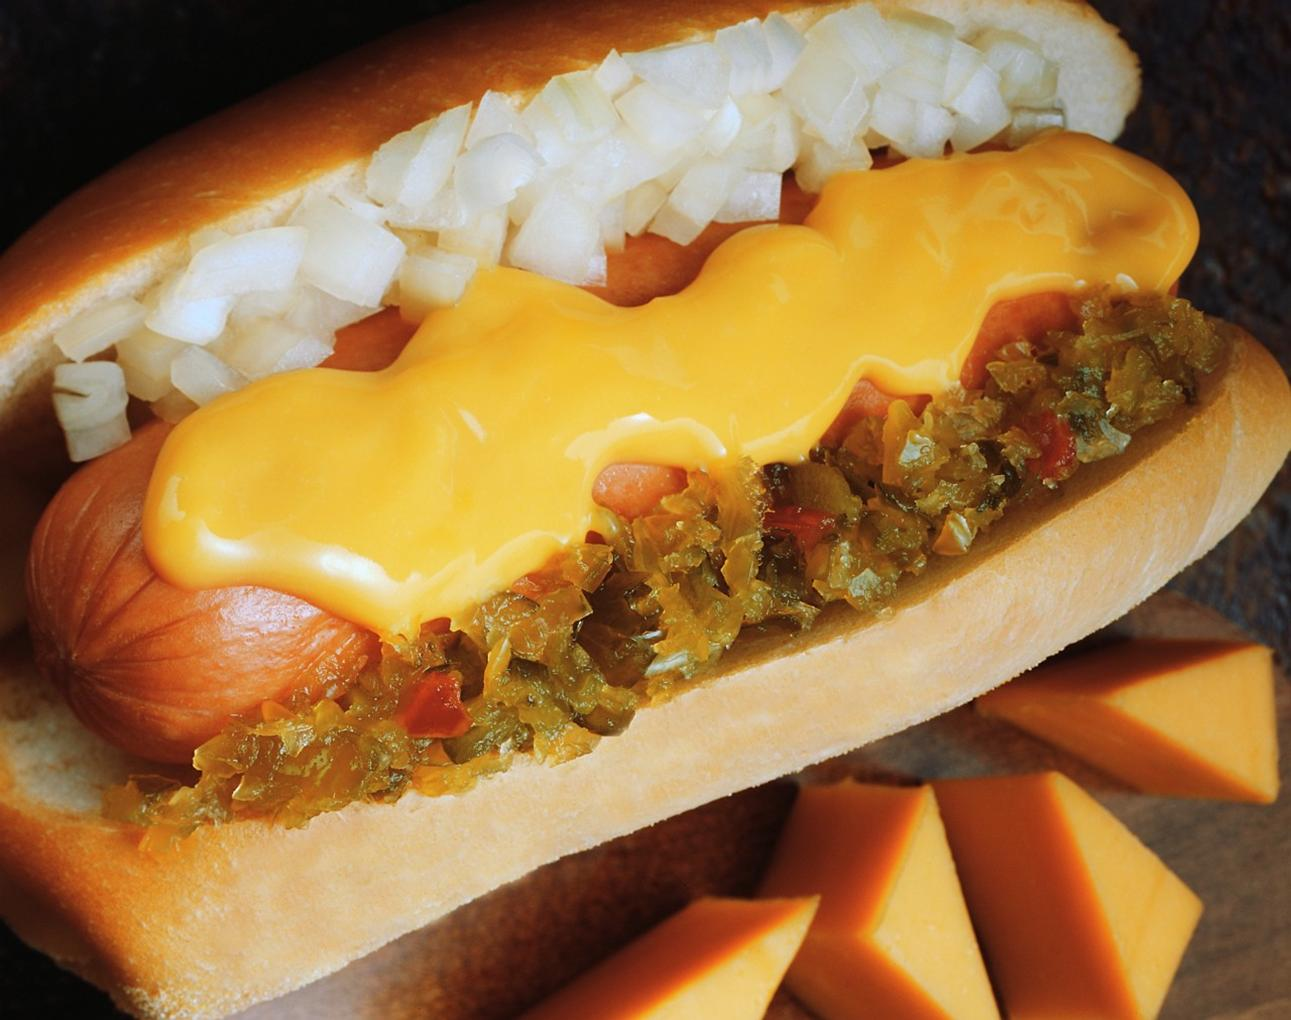 Chipolata Hot Dog